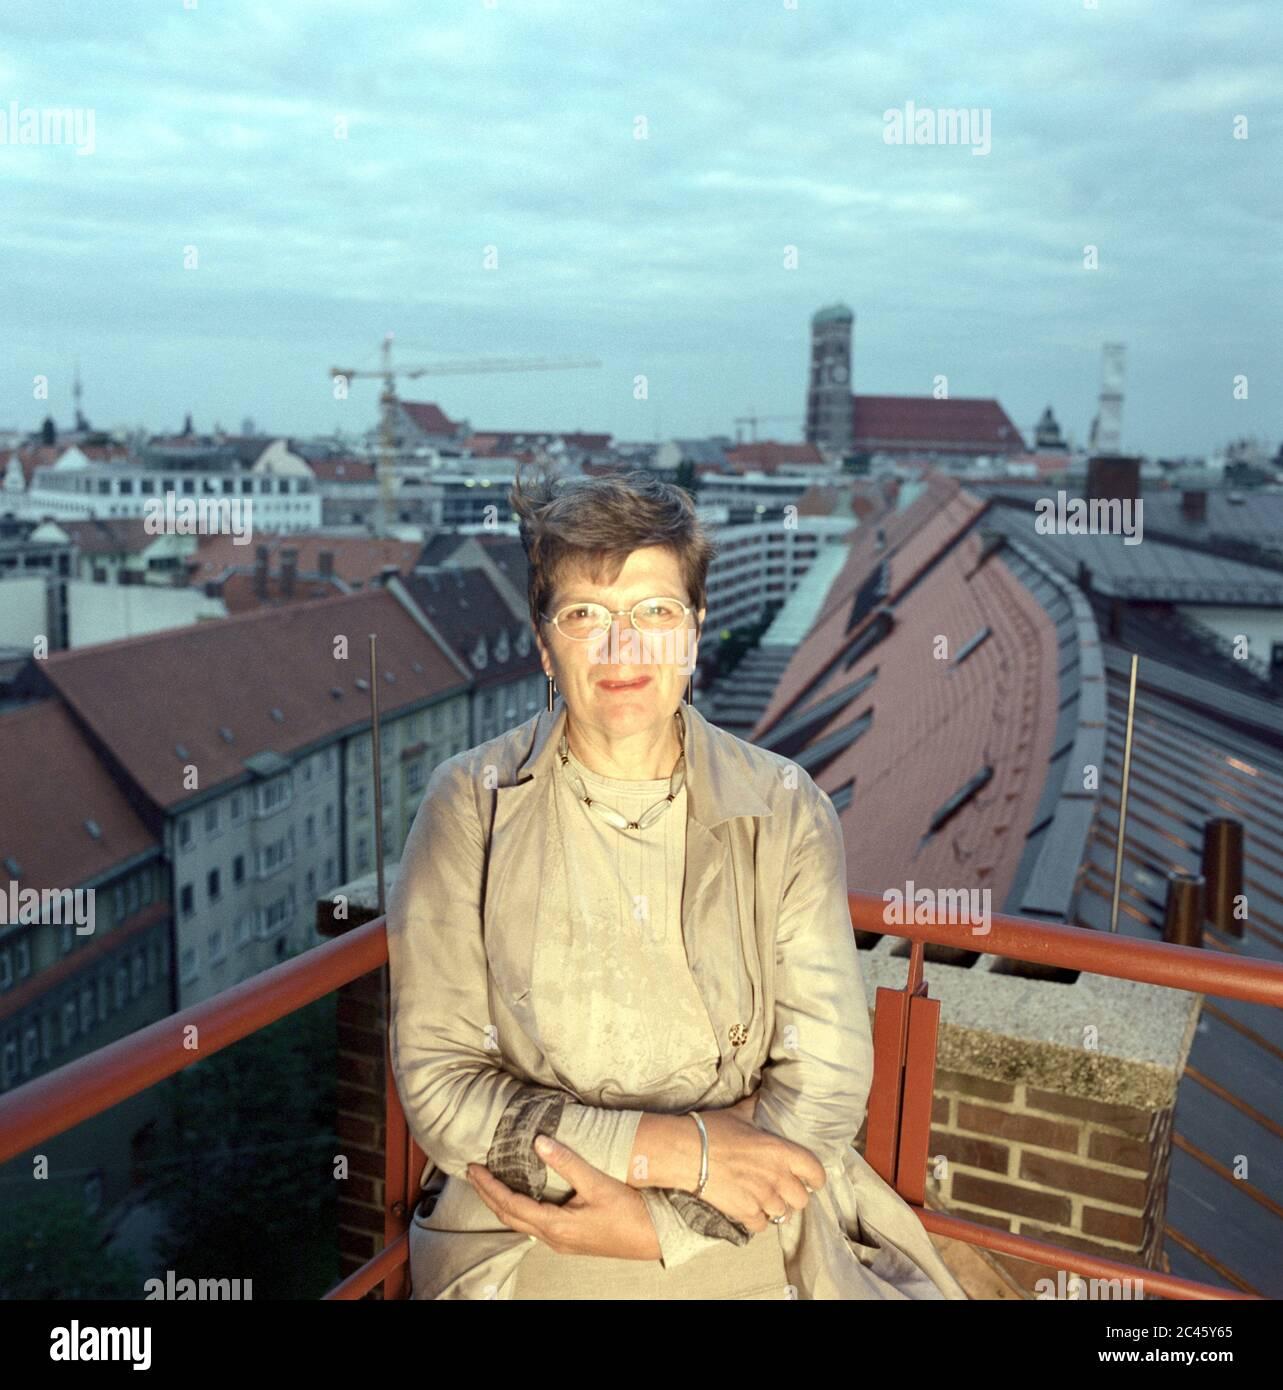 Christiane Thalgott - City Building Councilor Munich - Bavaria - Germany Stock Photo